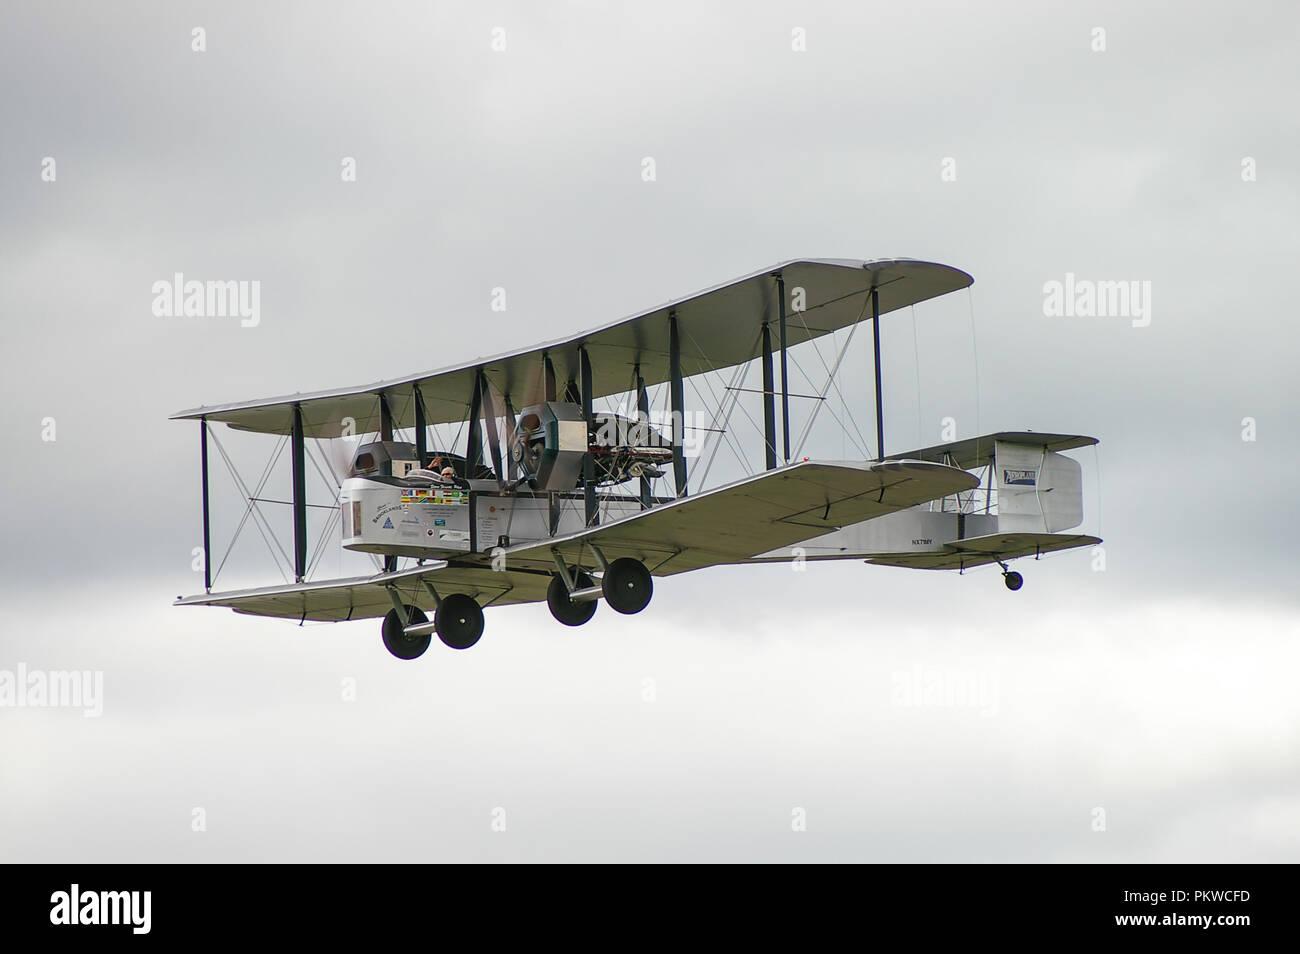 vickers-vimy-british-heavy-bomber-aircraft-plane-biplane-of-first-world-war-great-war-world-war-one-raf-recreated-alcock-brown-atlantic-flight-PKWCFD.jpg